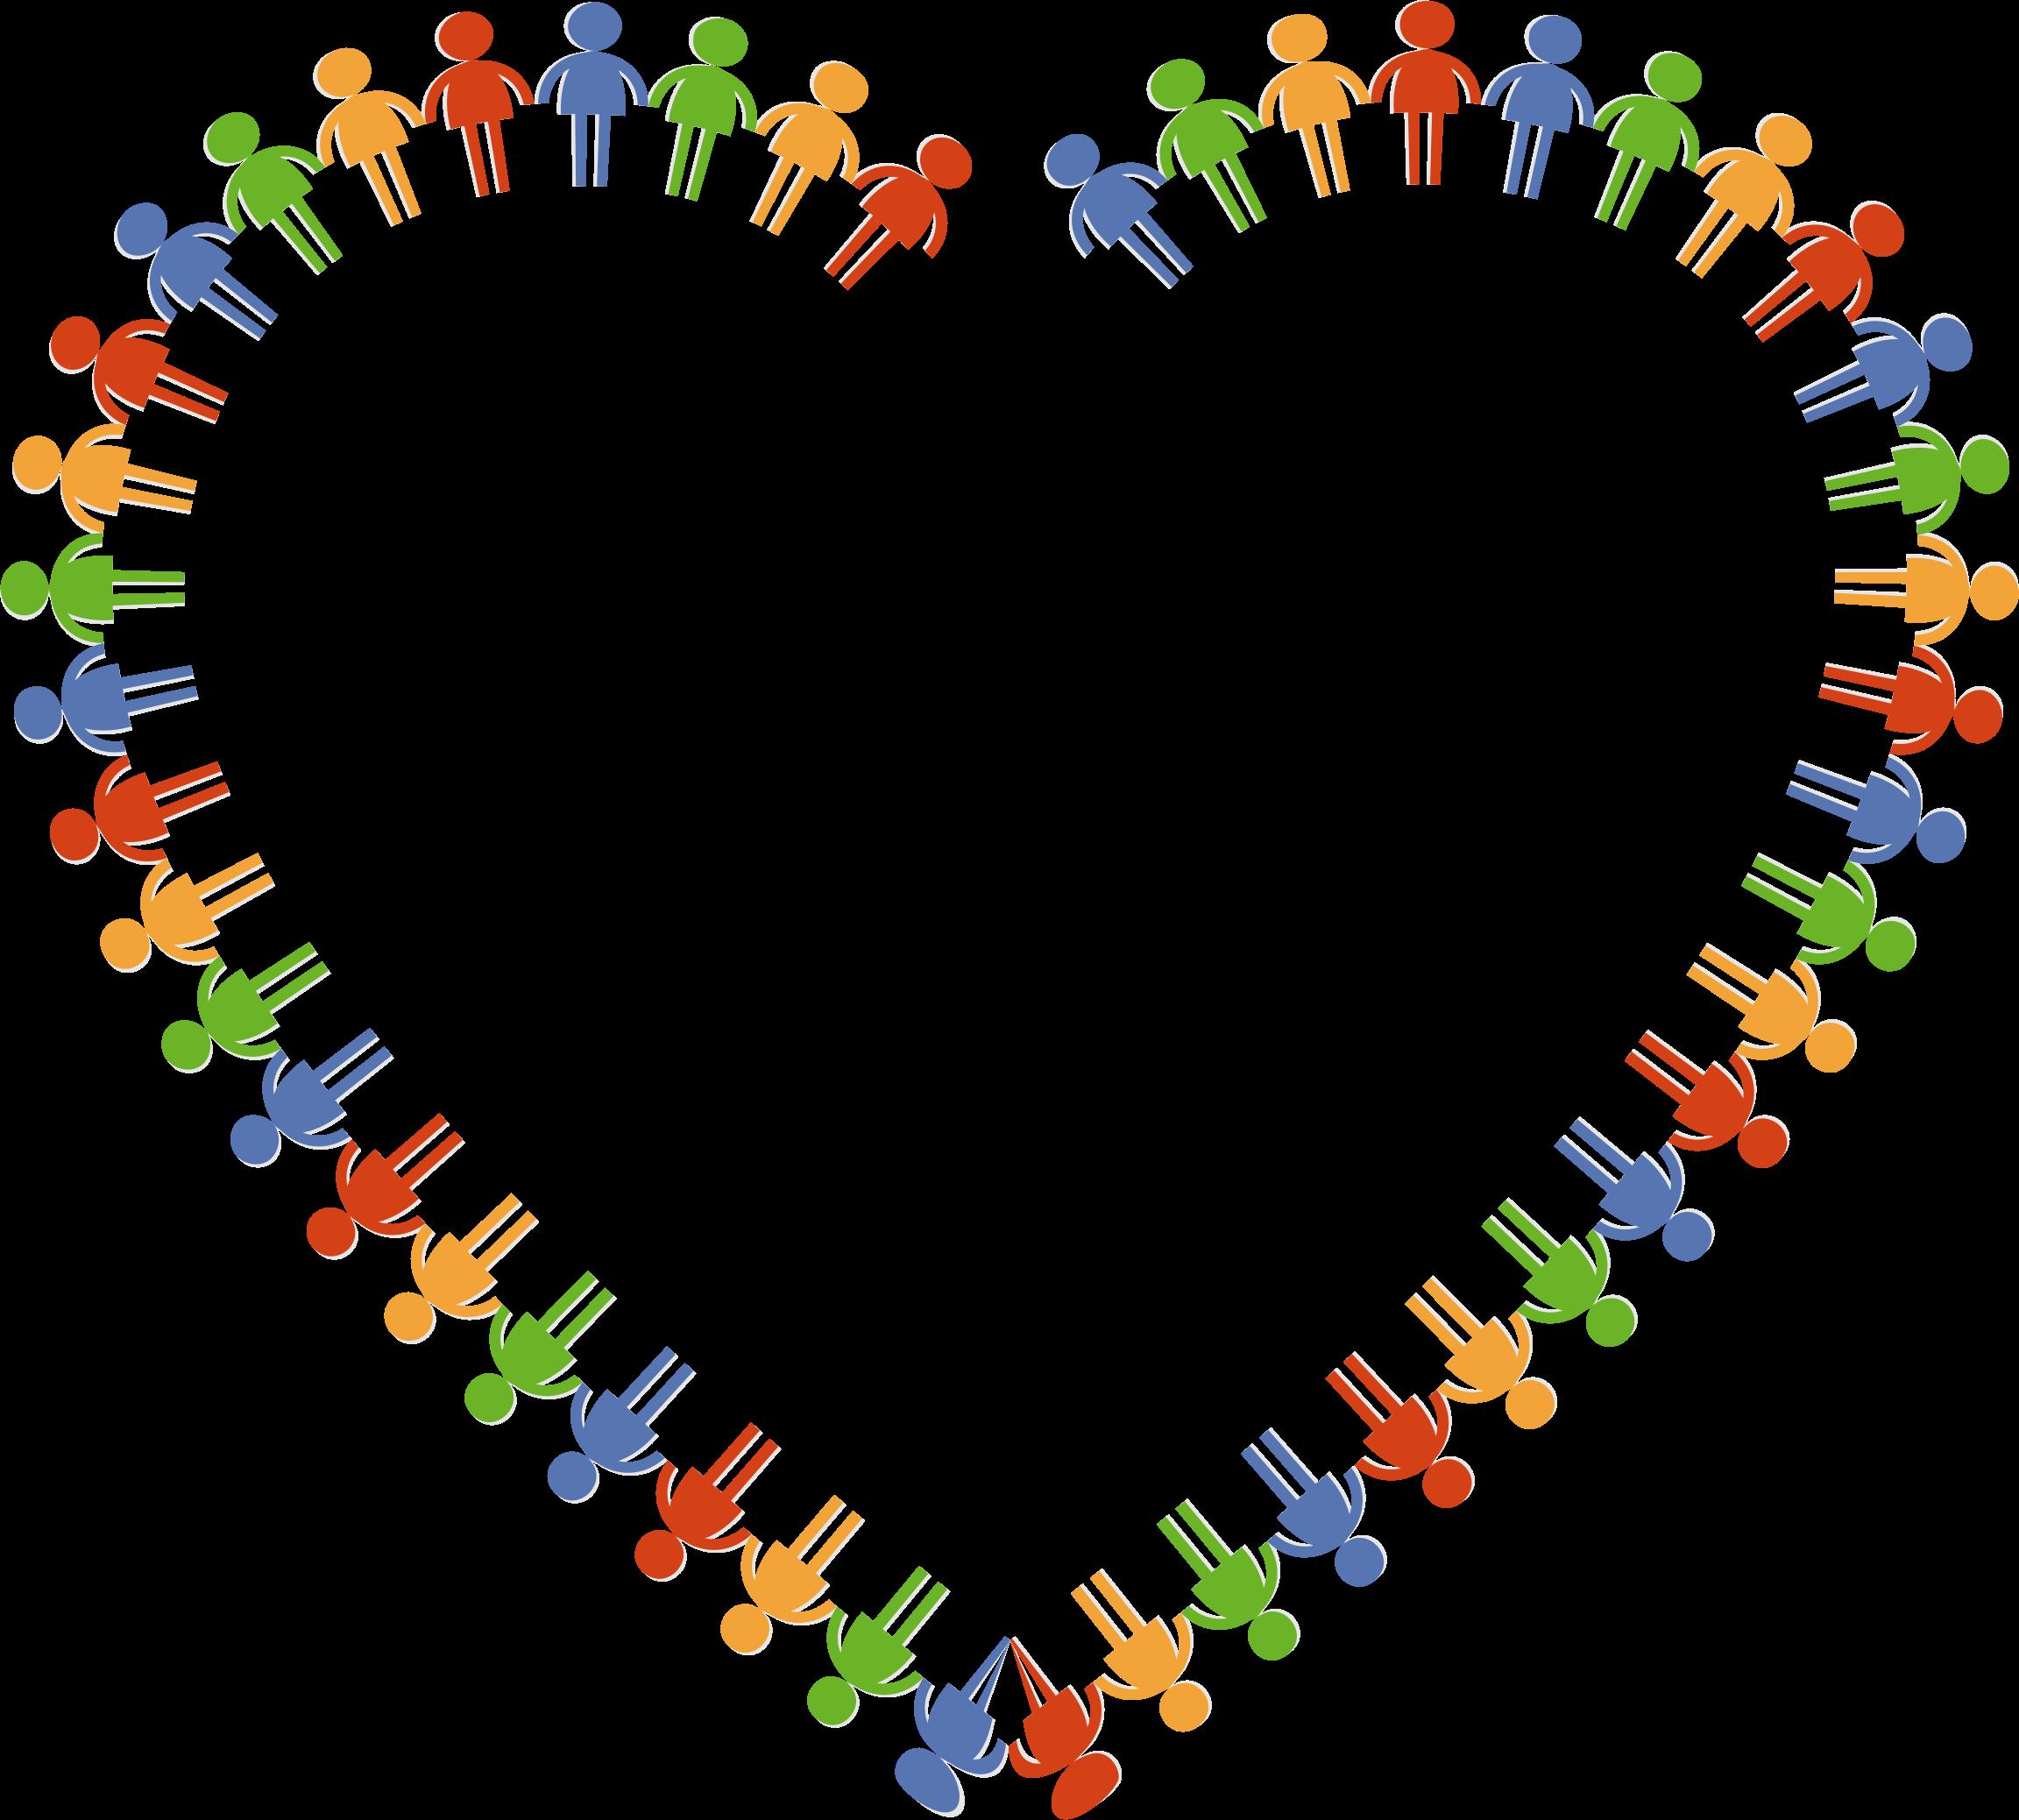 clipart community heart heart outline clip art image heart outline clip art border